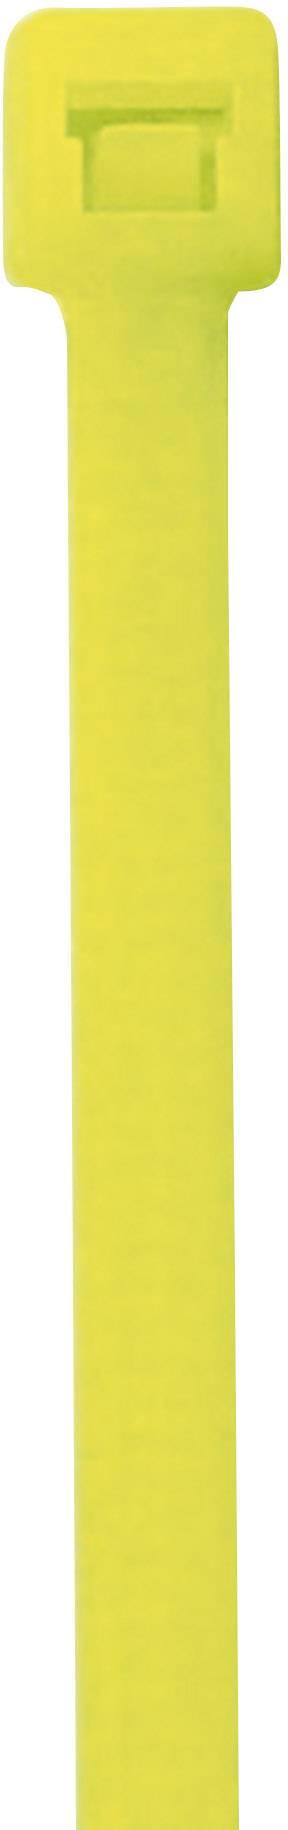 Neonska kabelska vezica, fluorescenčna (D x Š) 192 mm x 4.6 mm roza, 50 kosov, PB Fastener